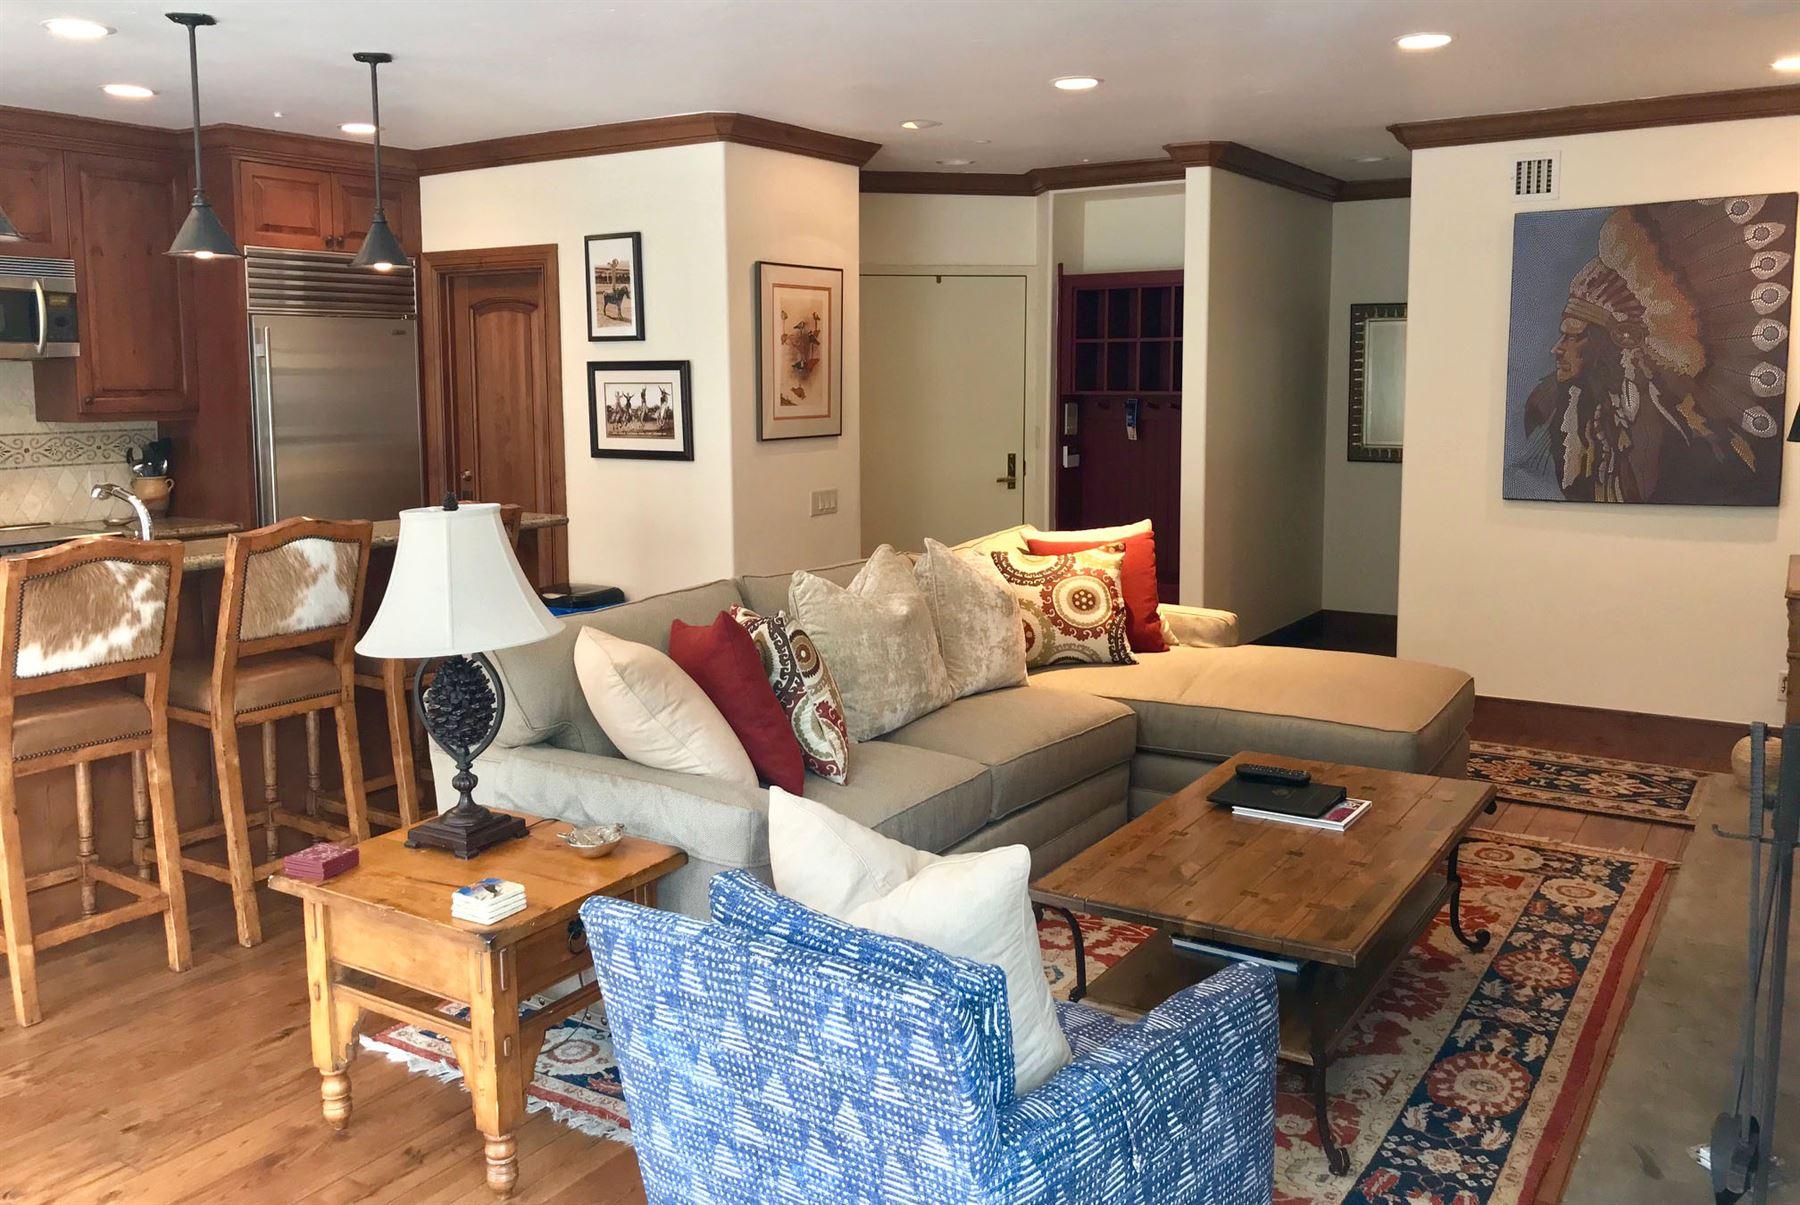 4BR_Plat_living room